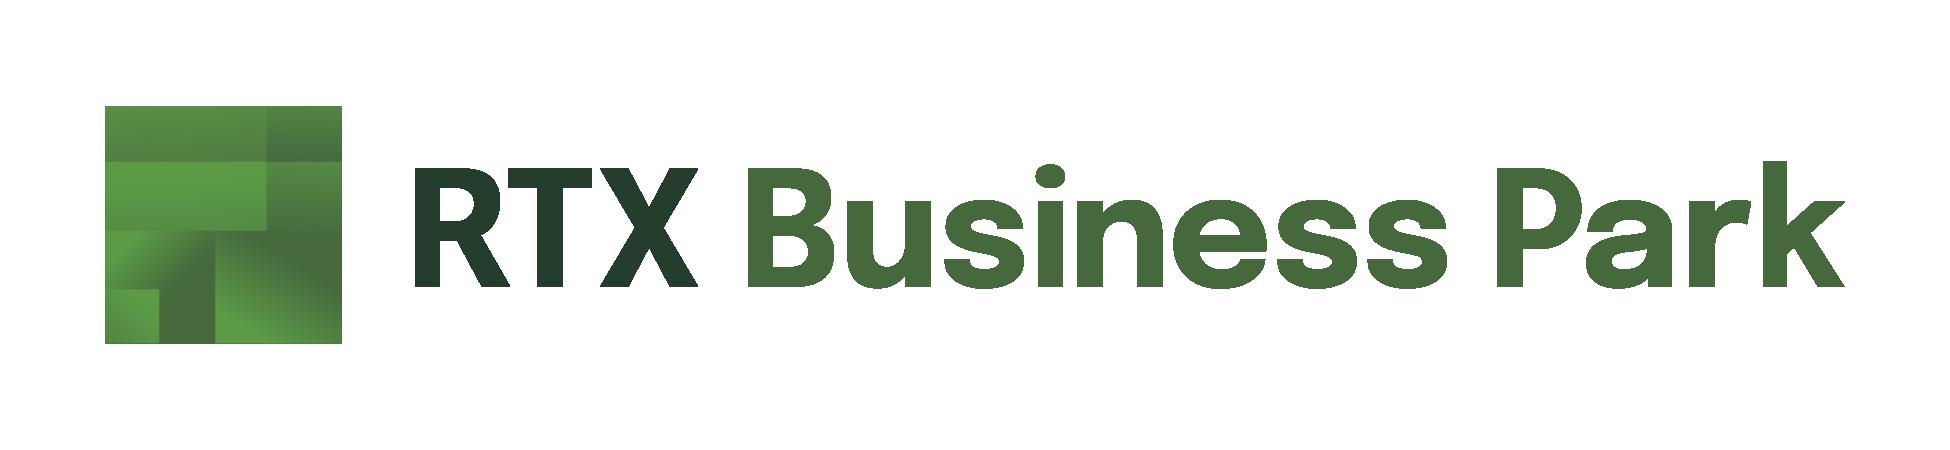 RTX Business Park - Logo